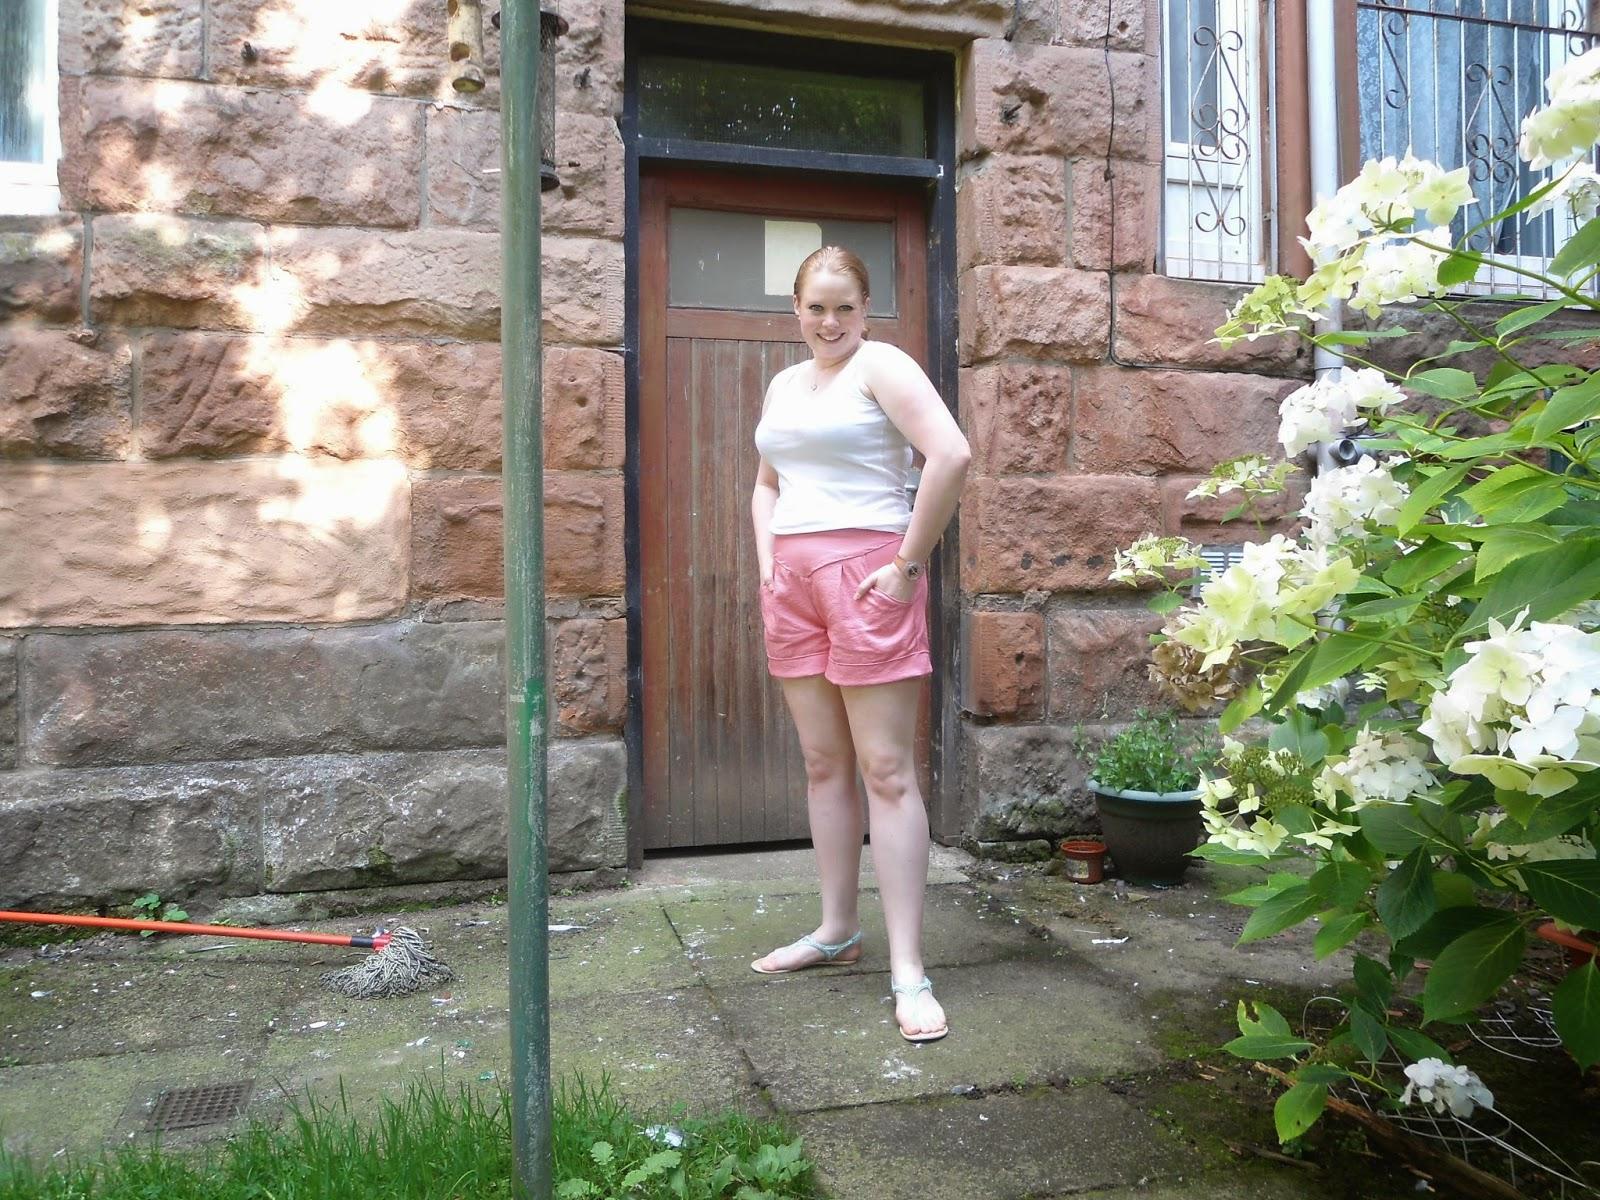 http://jennifercatherineshaw.blogspot.com/2014/09/owop-and-shiny-new-garment.html